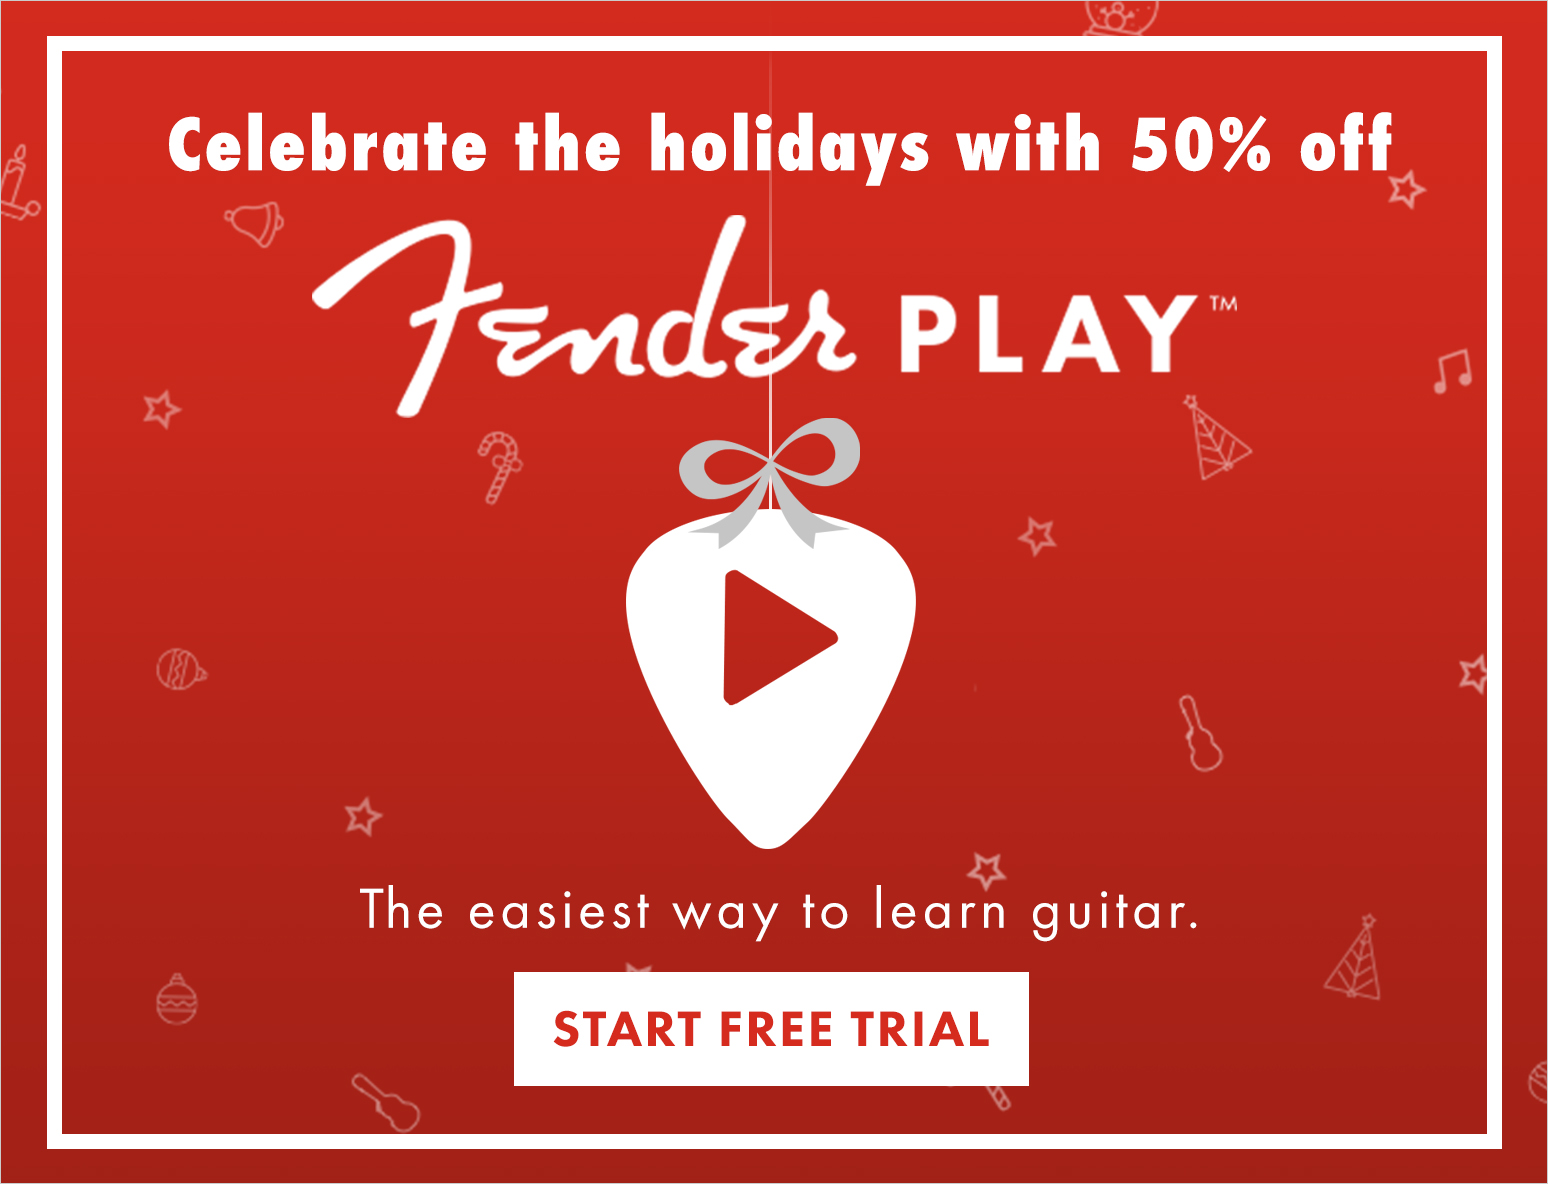 Holiday17_KeyArt2_red.jpg